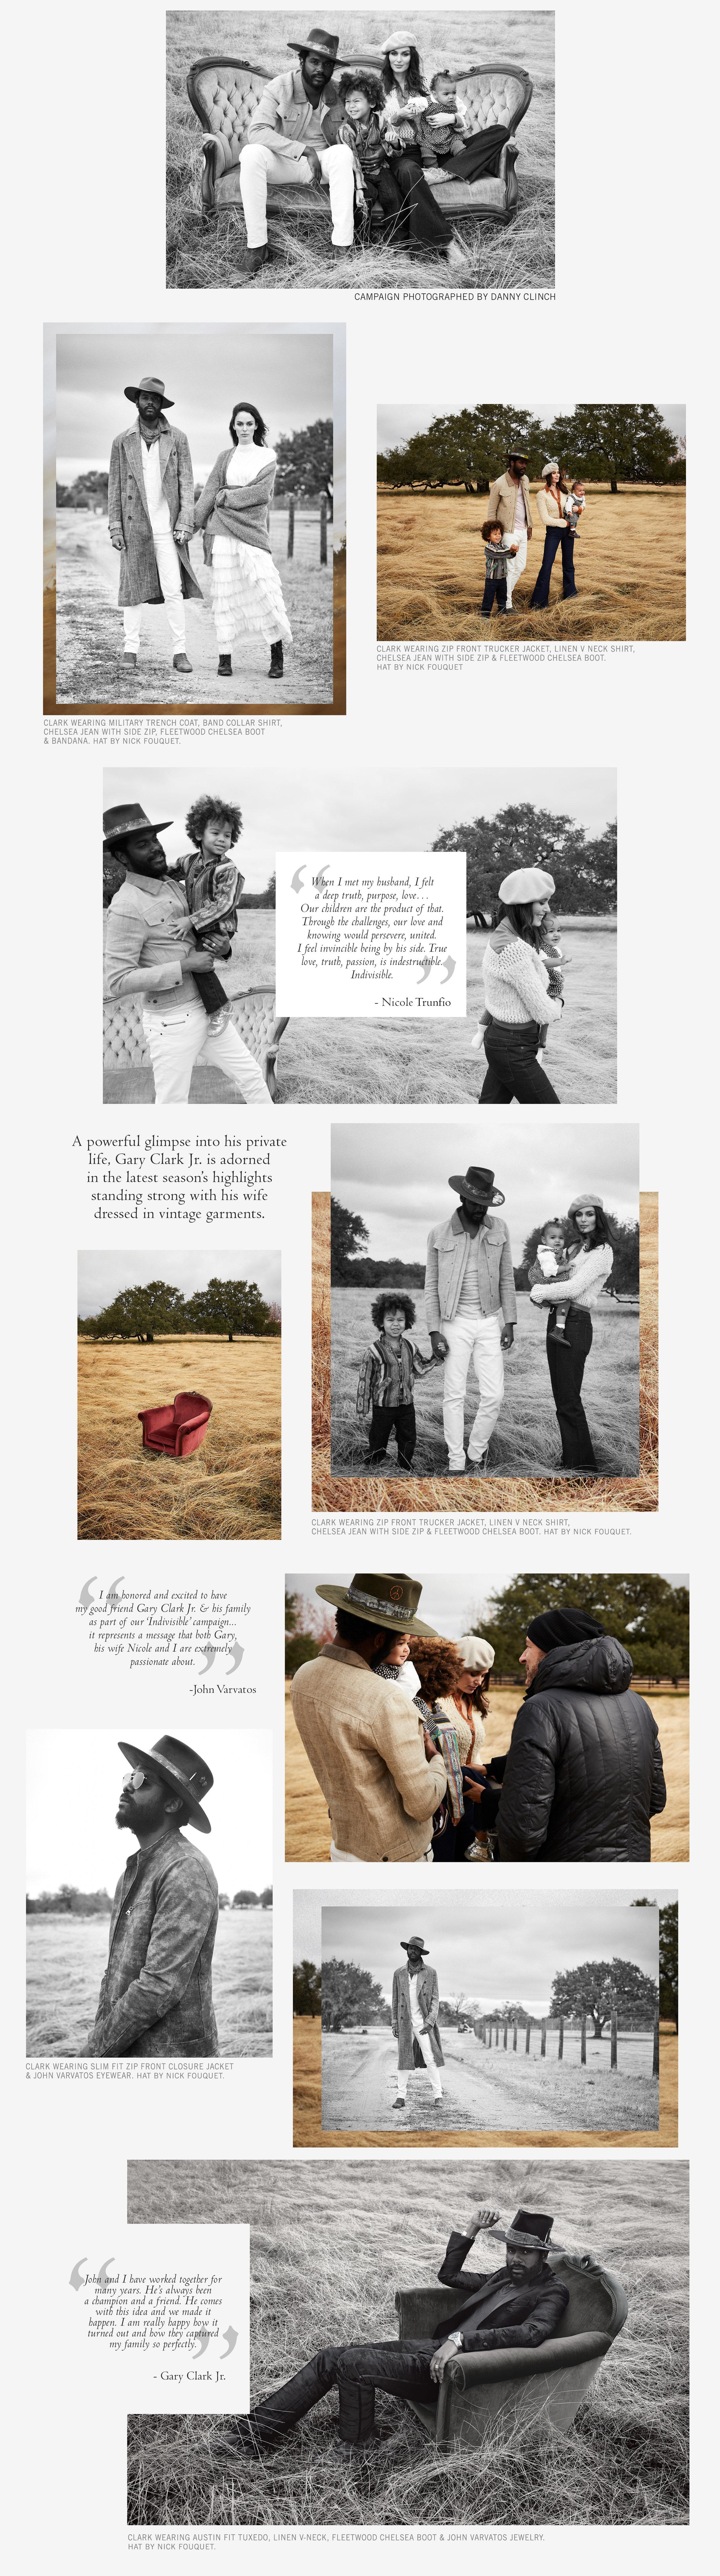 Nicole Trunfio Gary Clark Jr & Family - John Varvatos campaign main